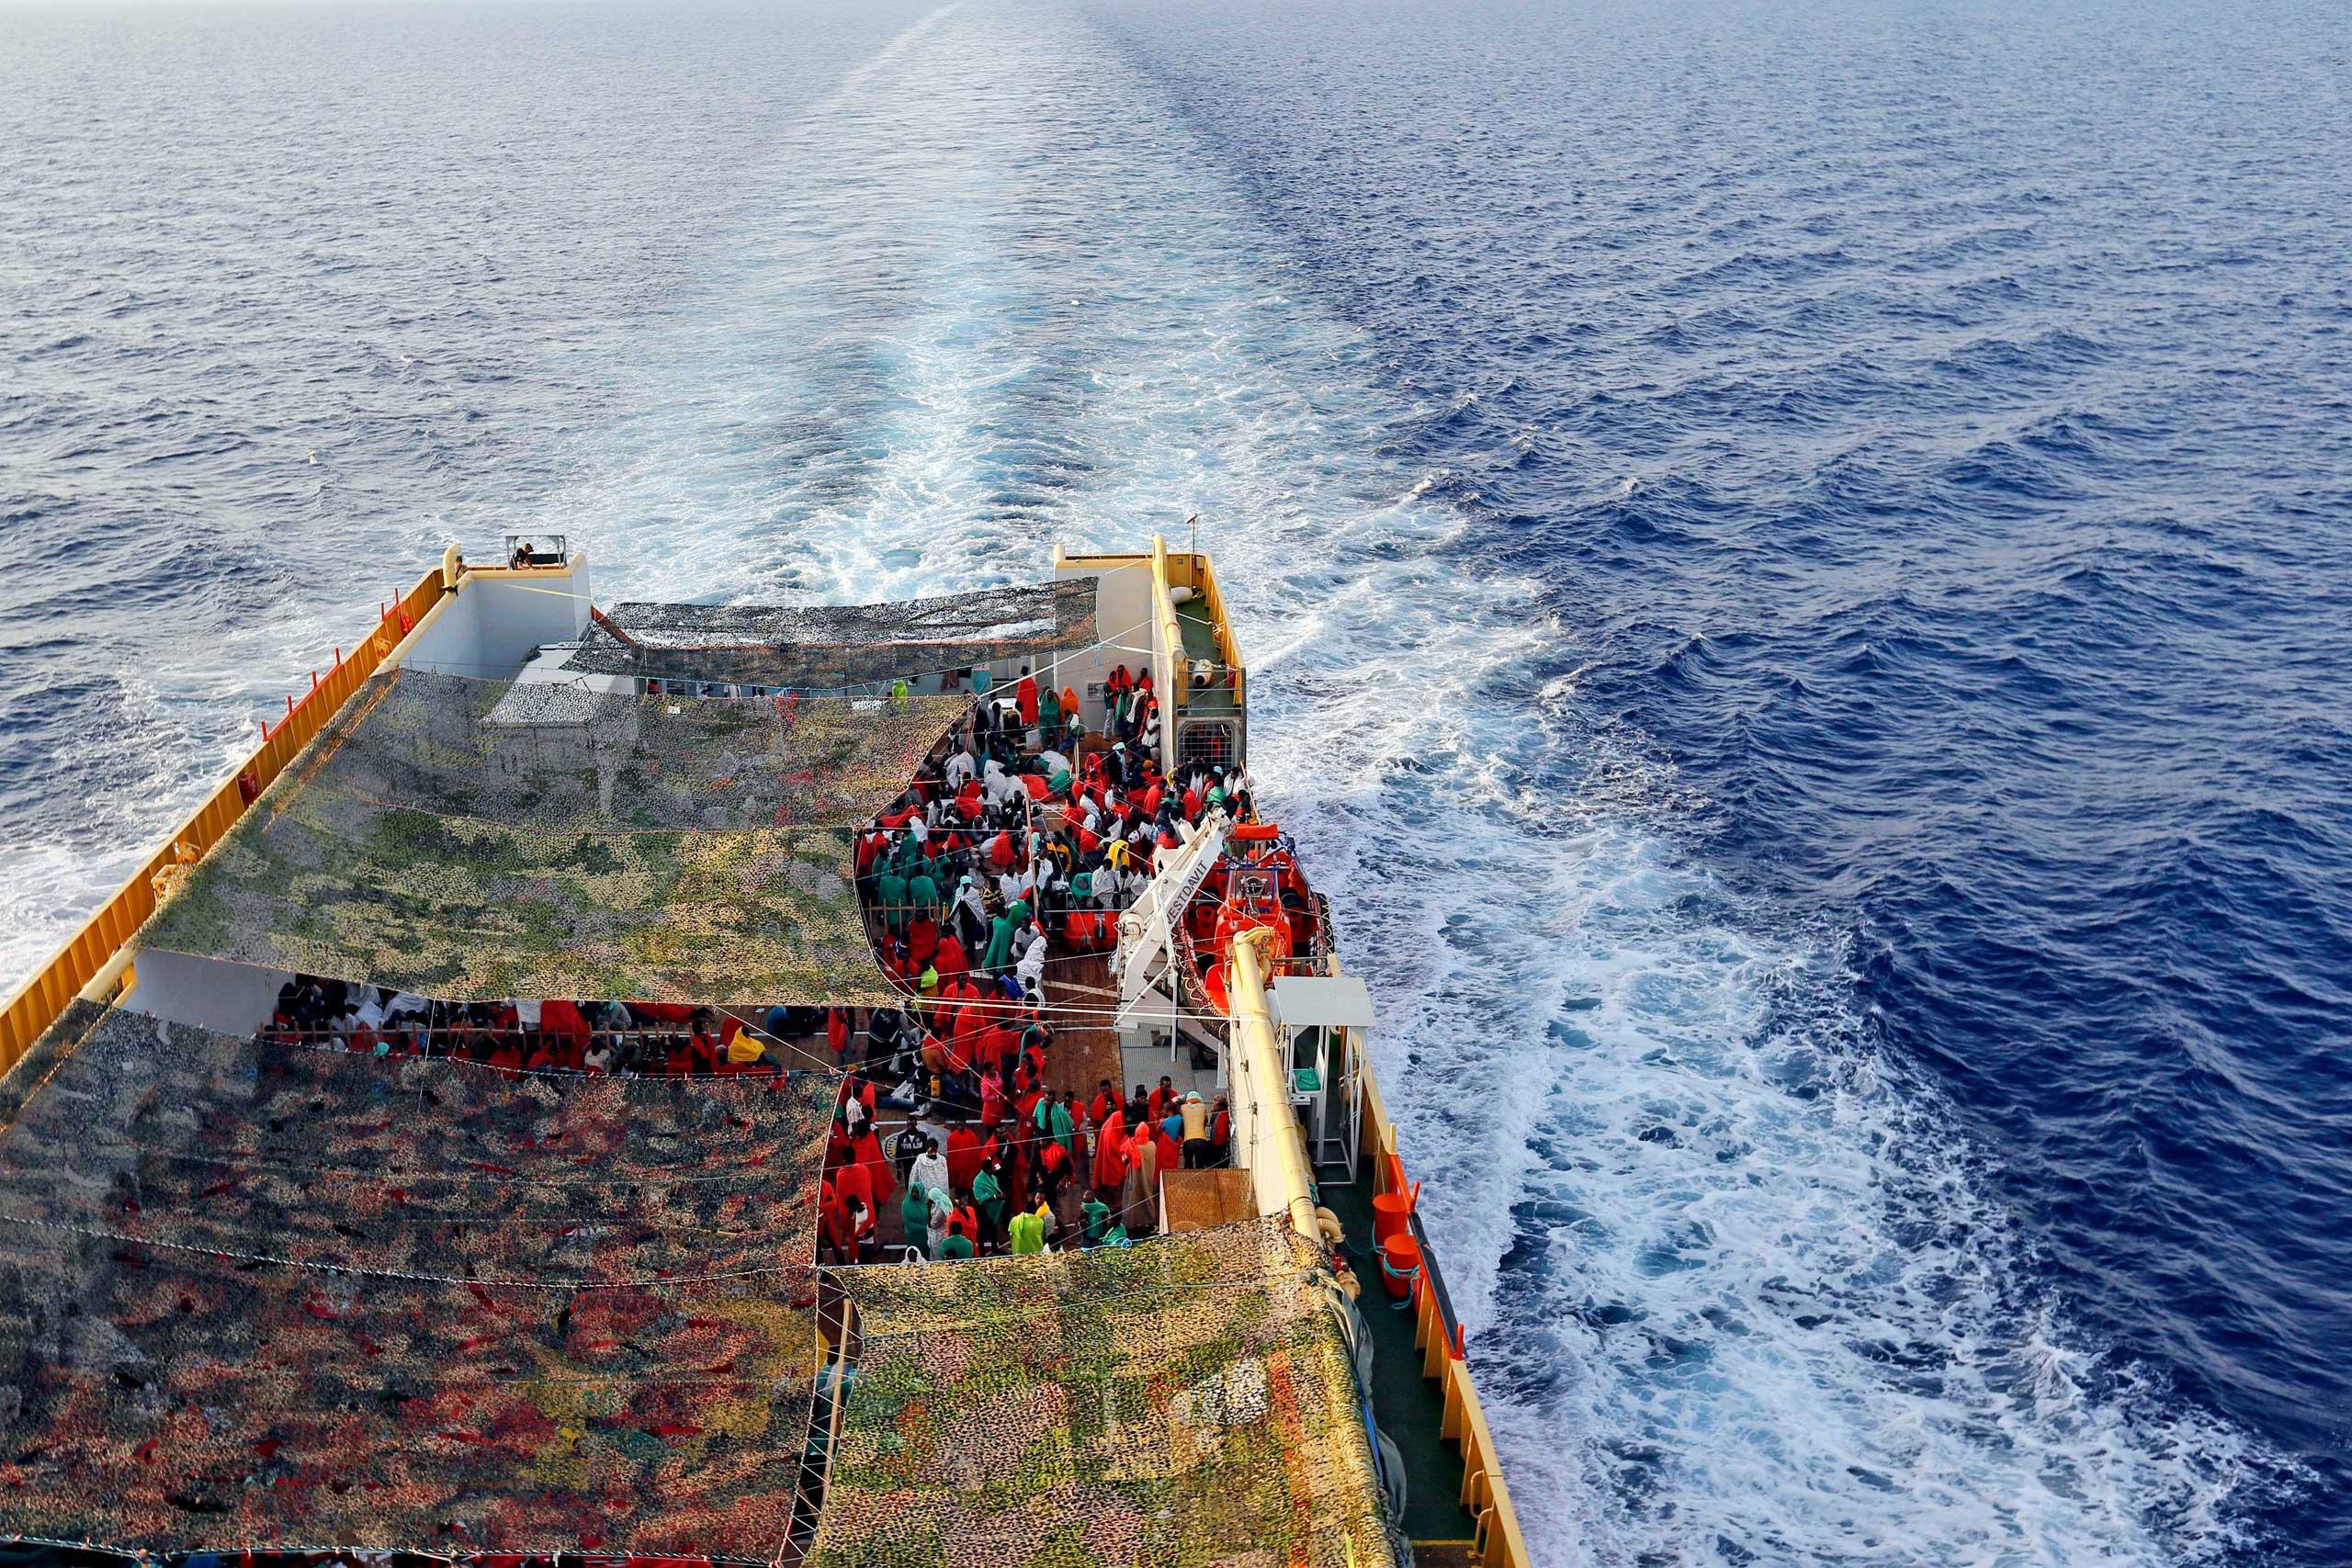 Migrants crowd the bridge of the Norwegian Siem Pilot ship sailing along the Mediterranean sea, on Sept. 2, 2015.